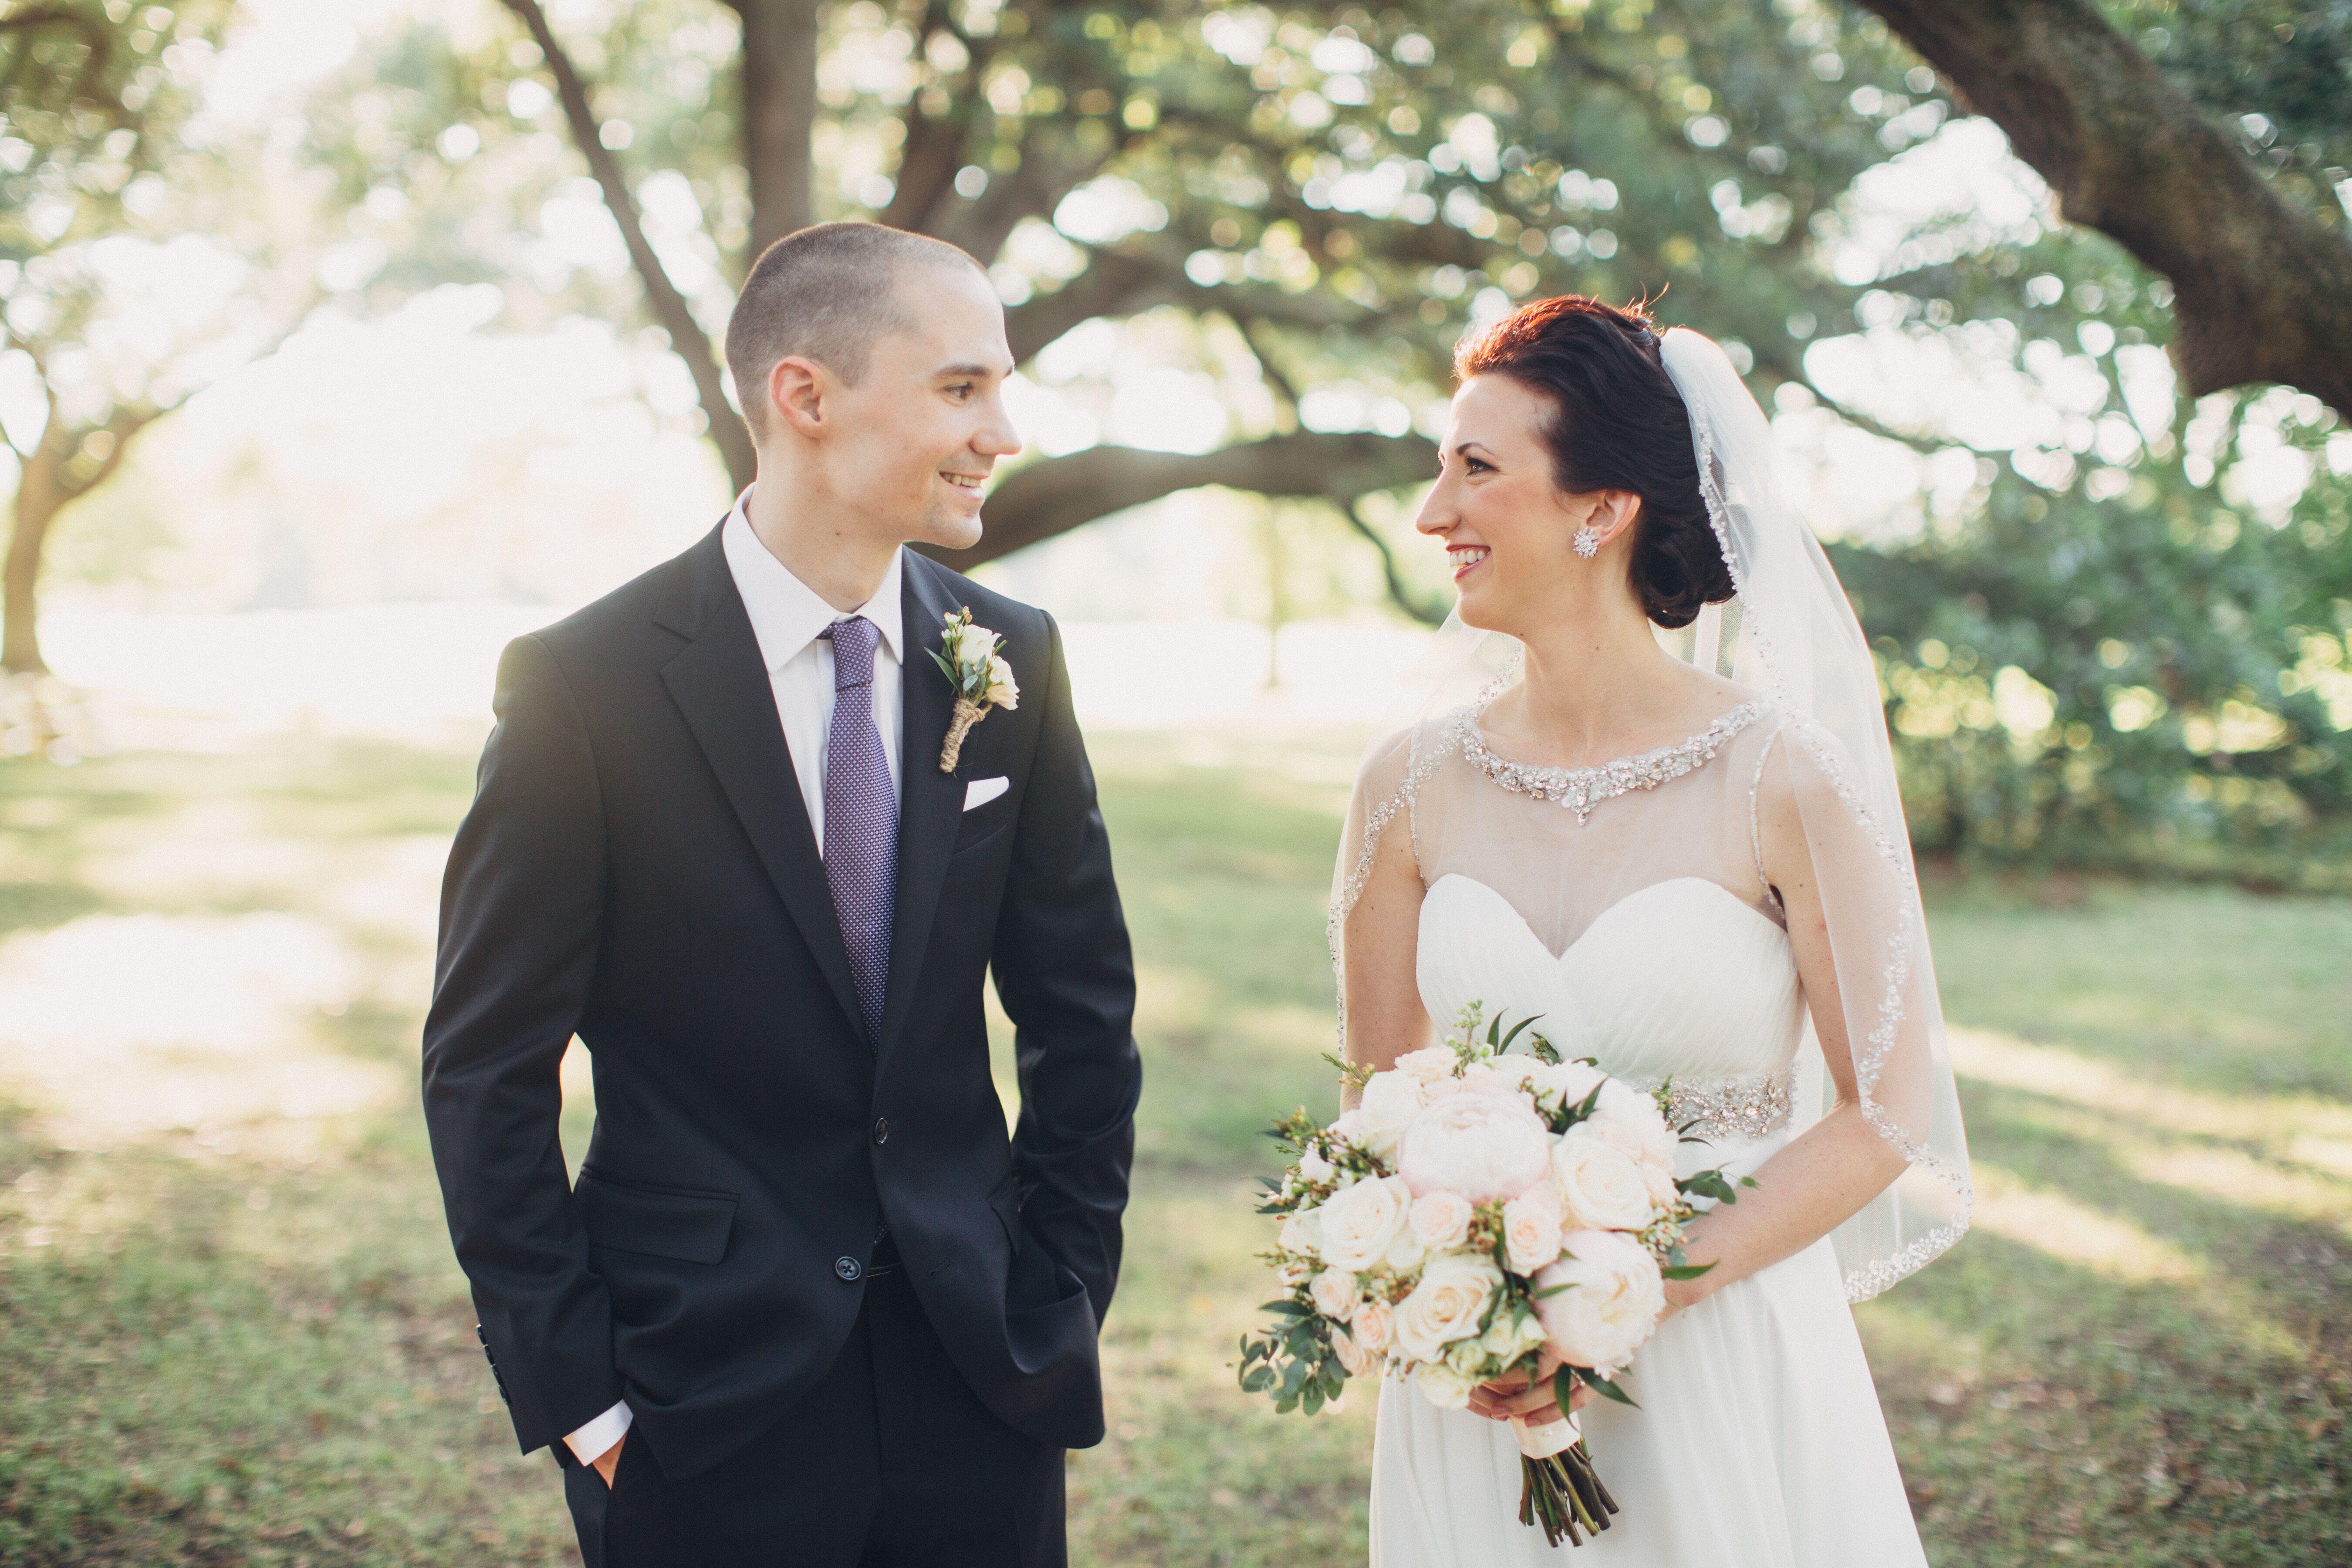 A Romantic Natural New Orleans Wedding At Audubon